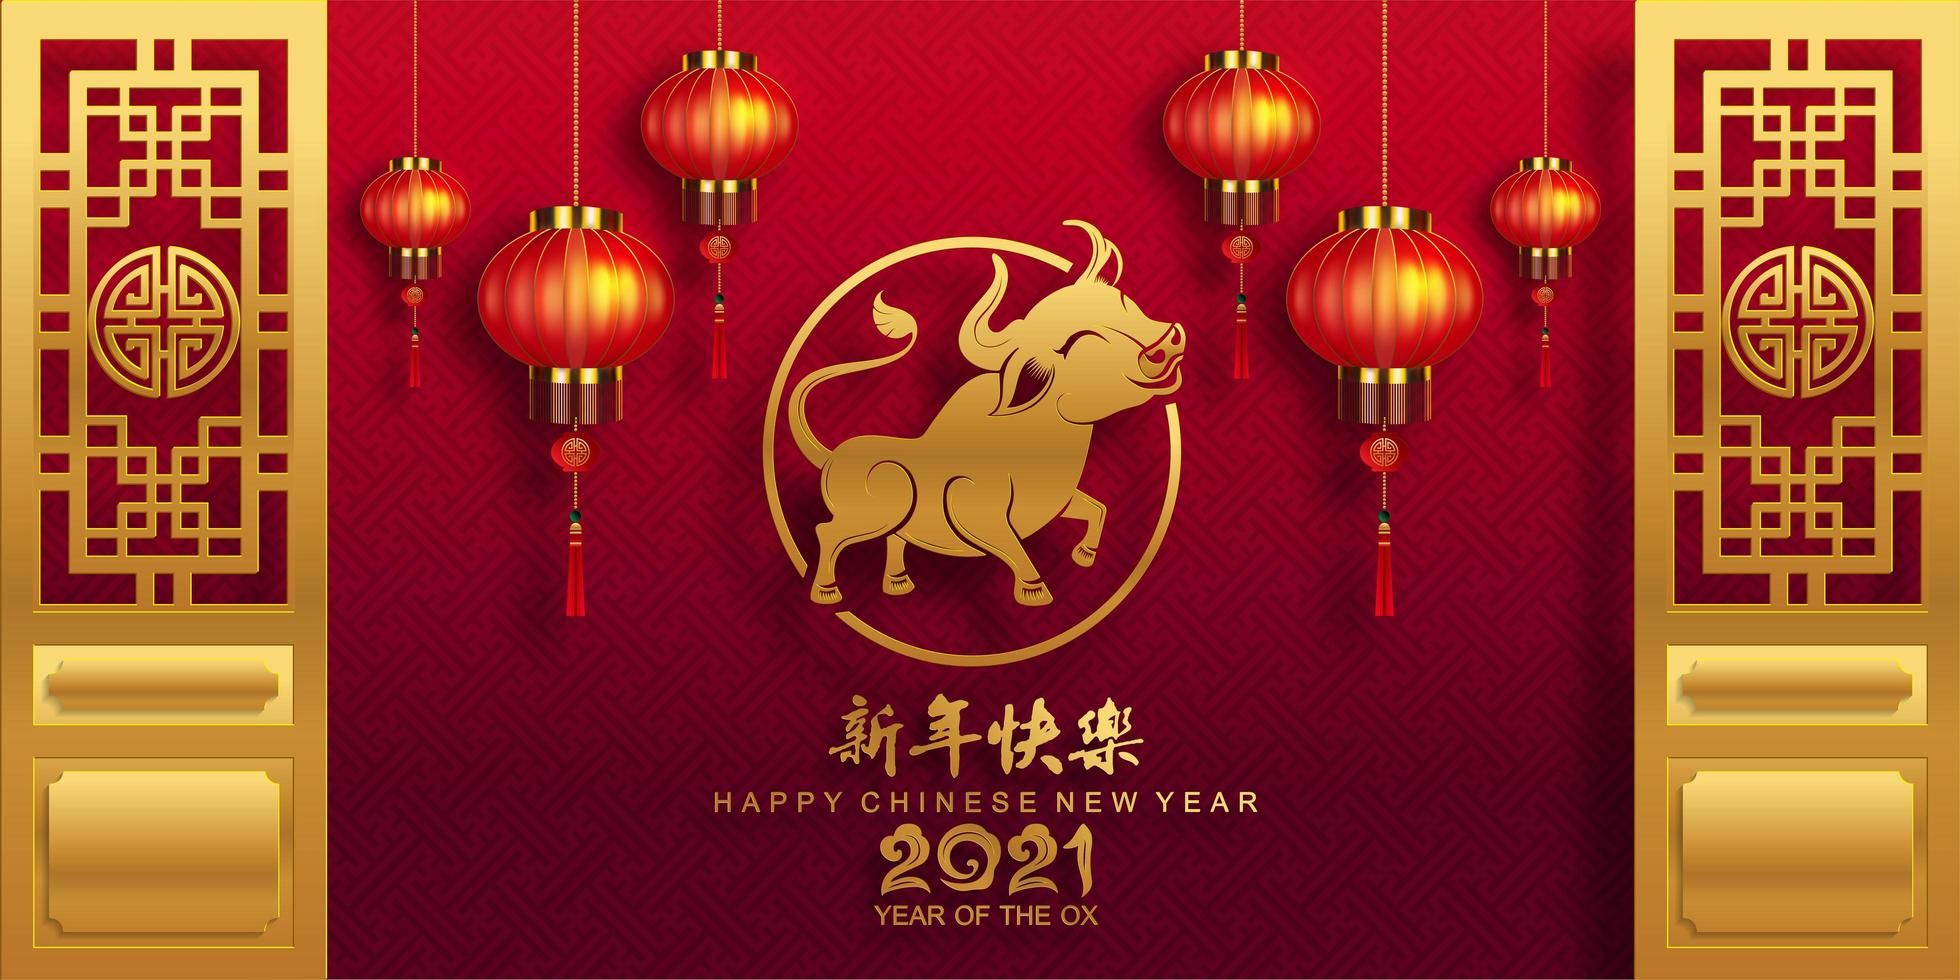 Happy New Year 2021 Chinese New Year 2021 Chinese New Year 2021 Banner